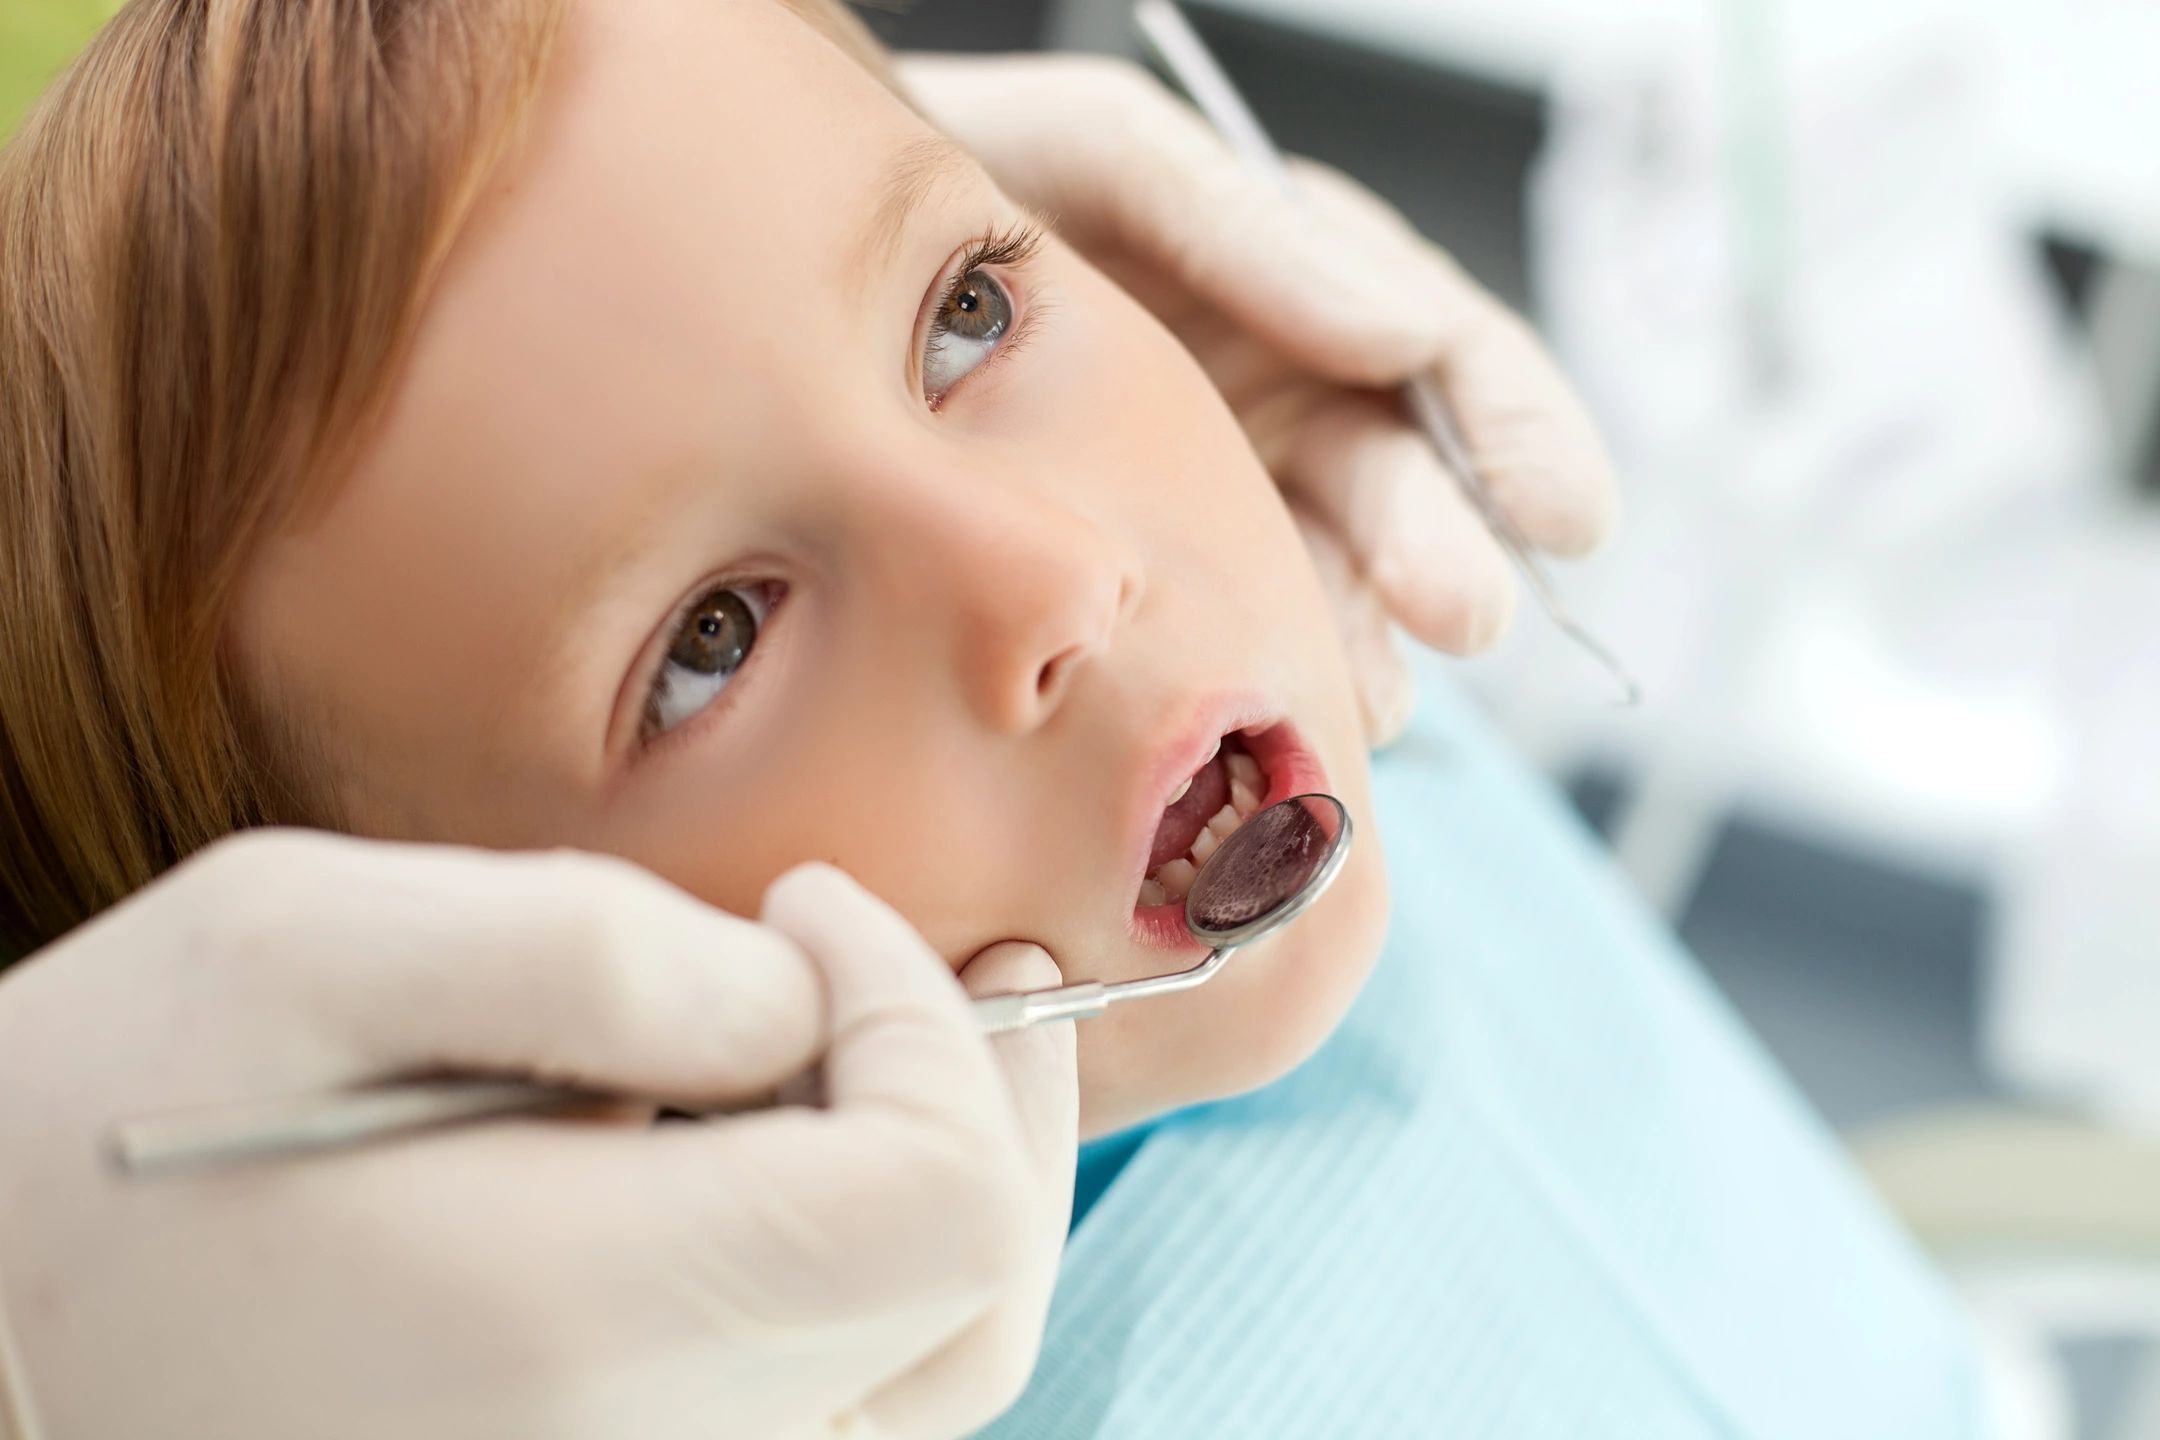 pediatric dentist  dentist  dentistry  Florence, ky  Dr. Ron Elliott Cincinnati  northern Kentucky  childrens dentist  general cleaning  exam  teenager dentist  oral hygiene